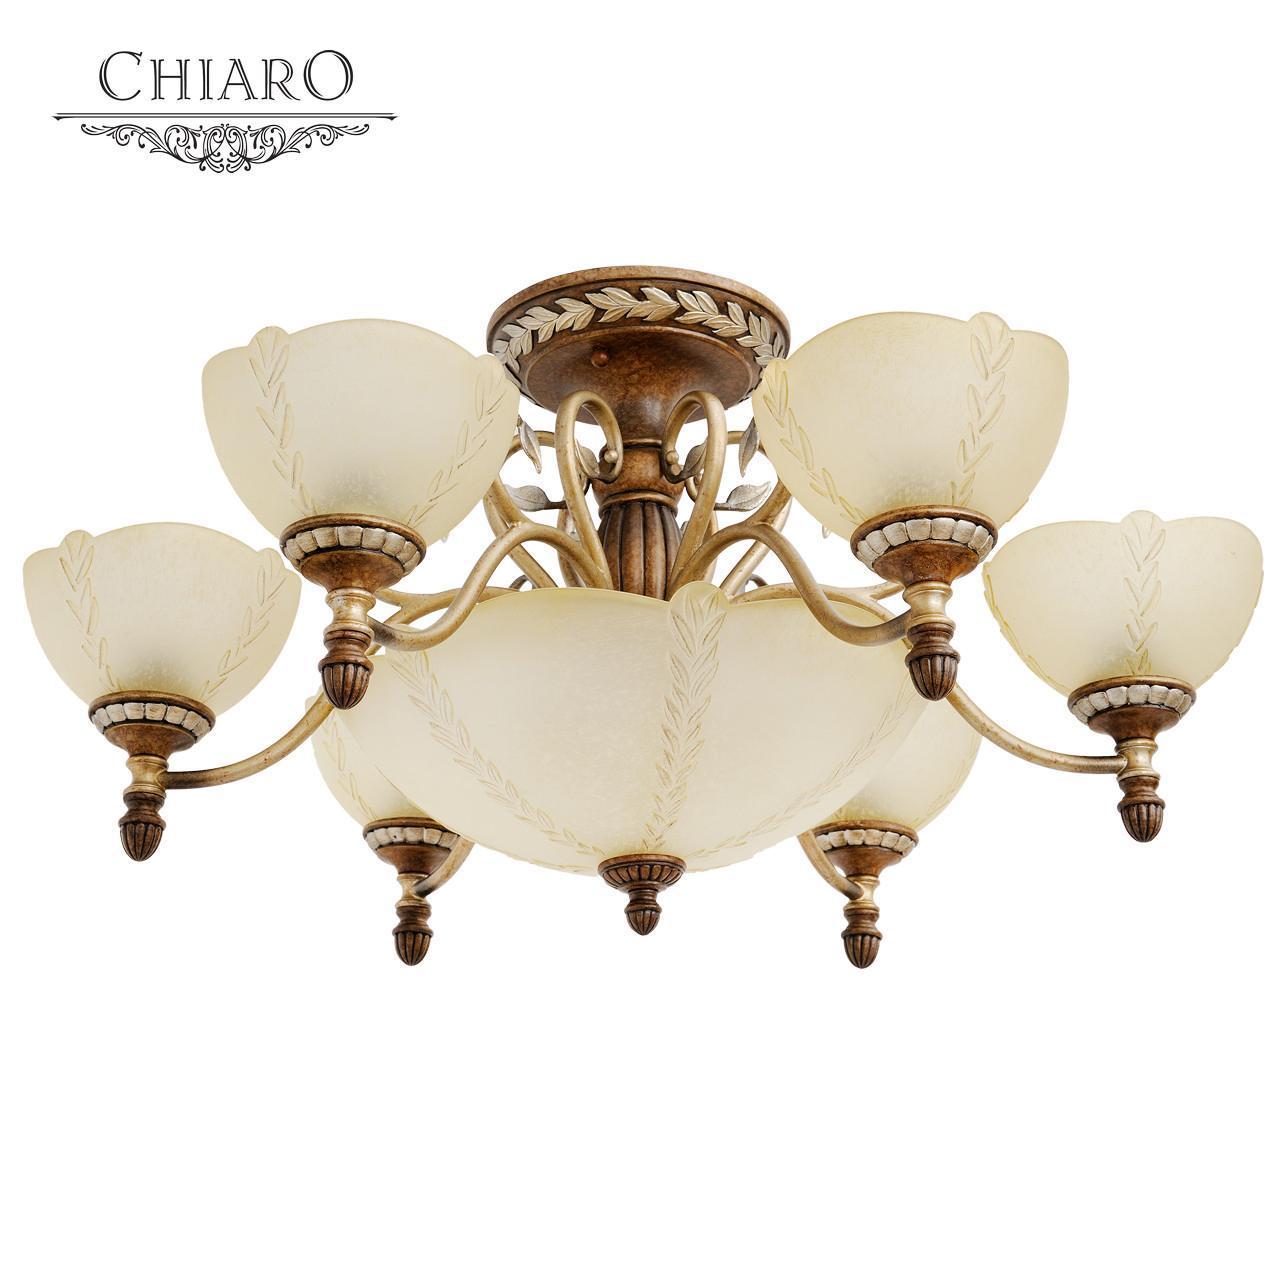 Люстра Chiaro Версаче 254012909 потолочная to4rooms лампа потолочная sofía